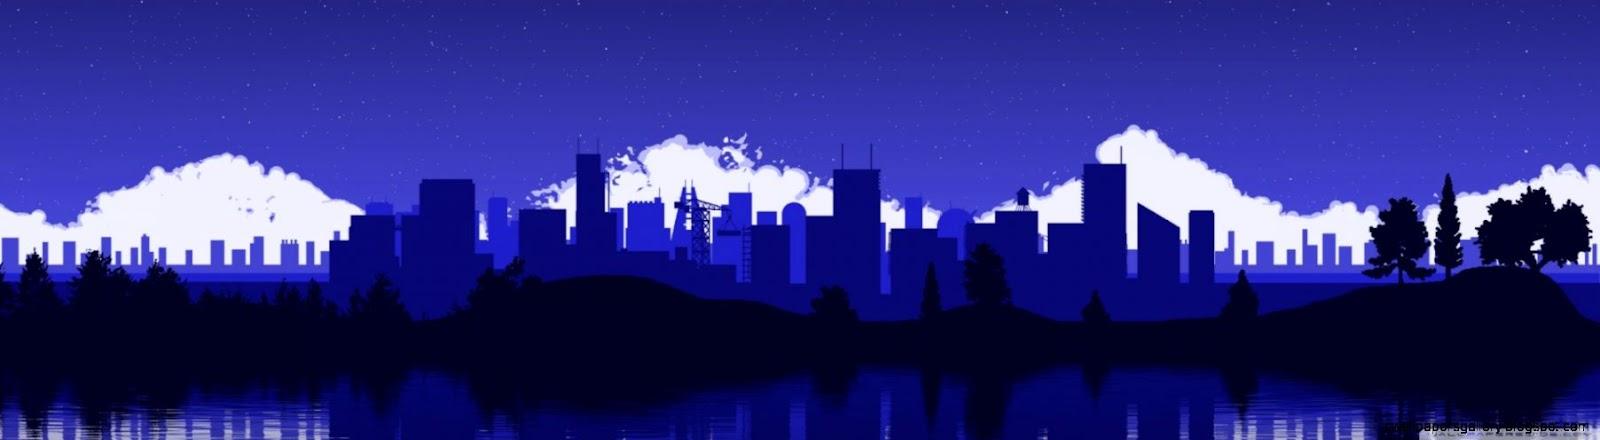 City Skyline Silhouette HD desktop wallpaper  High Definition